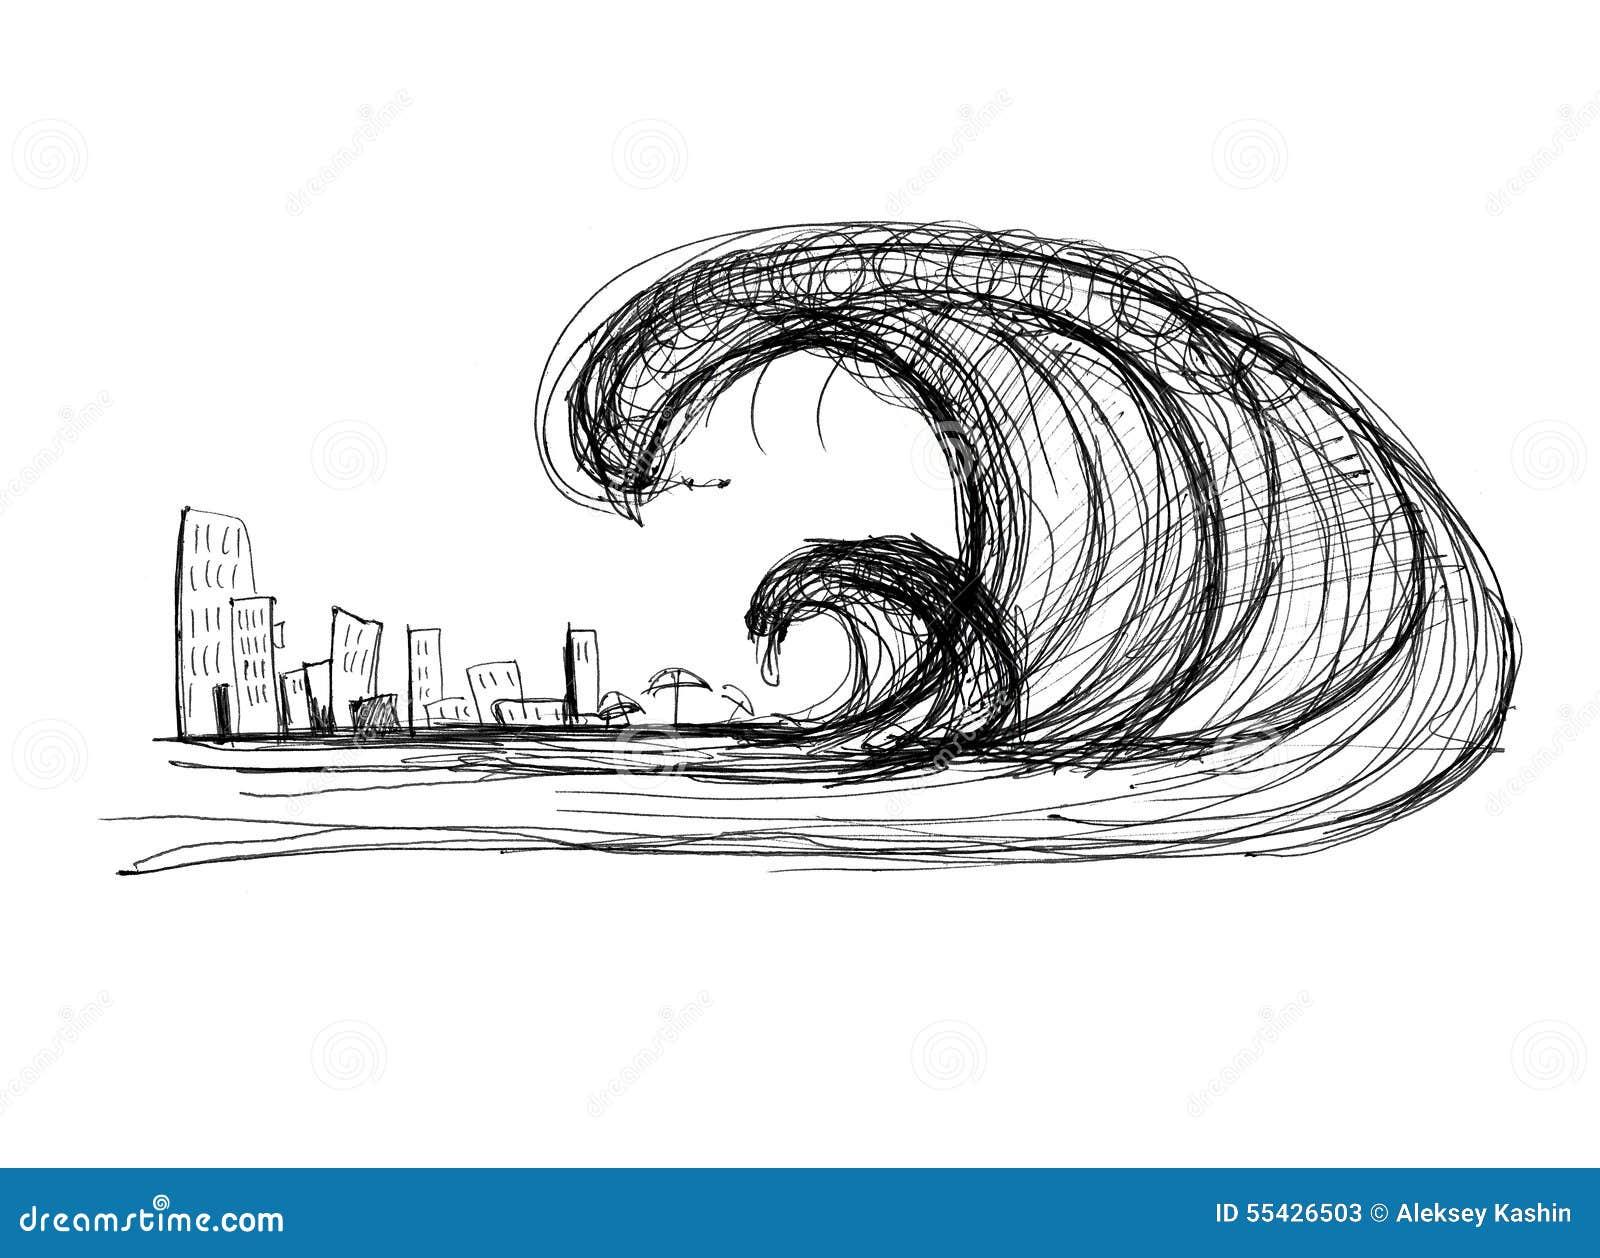 Tsunami Stock Illustration - Image: 55426503